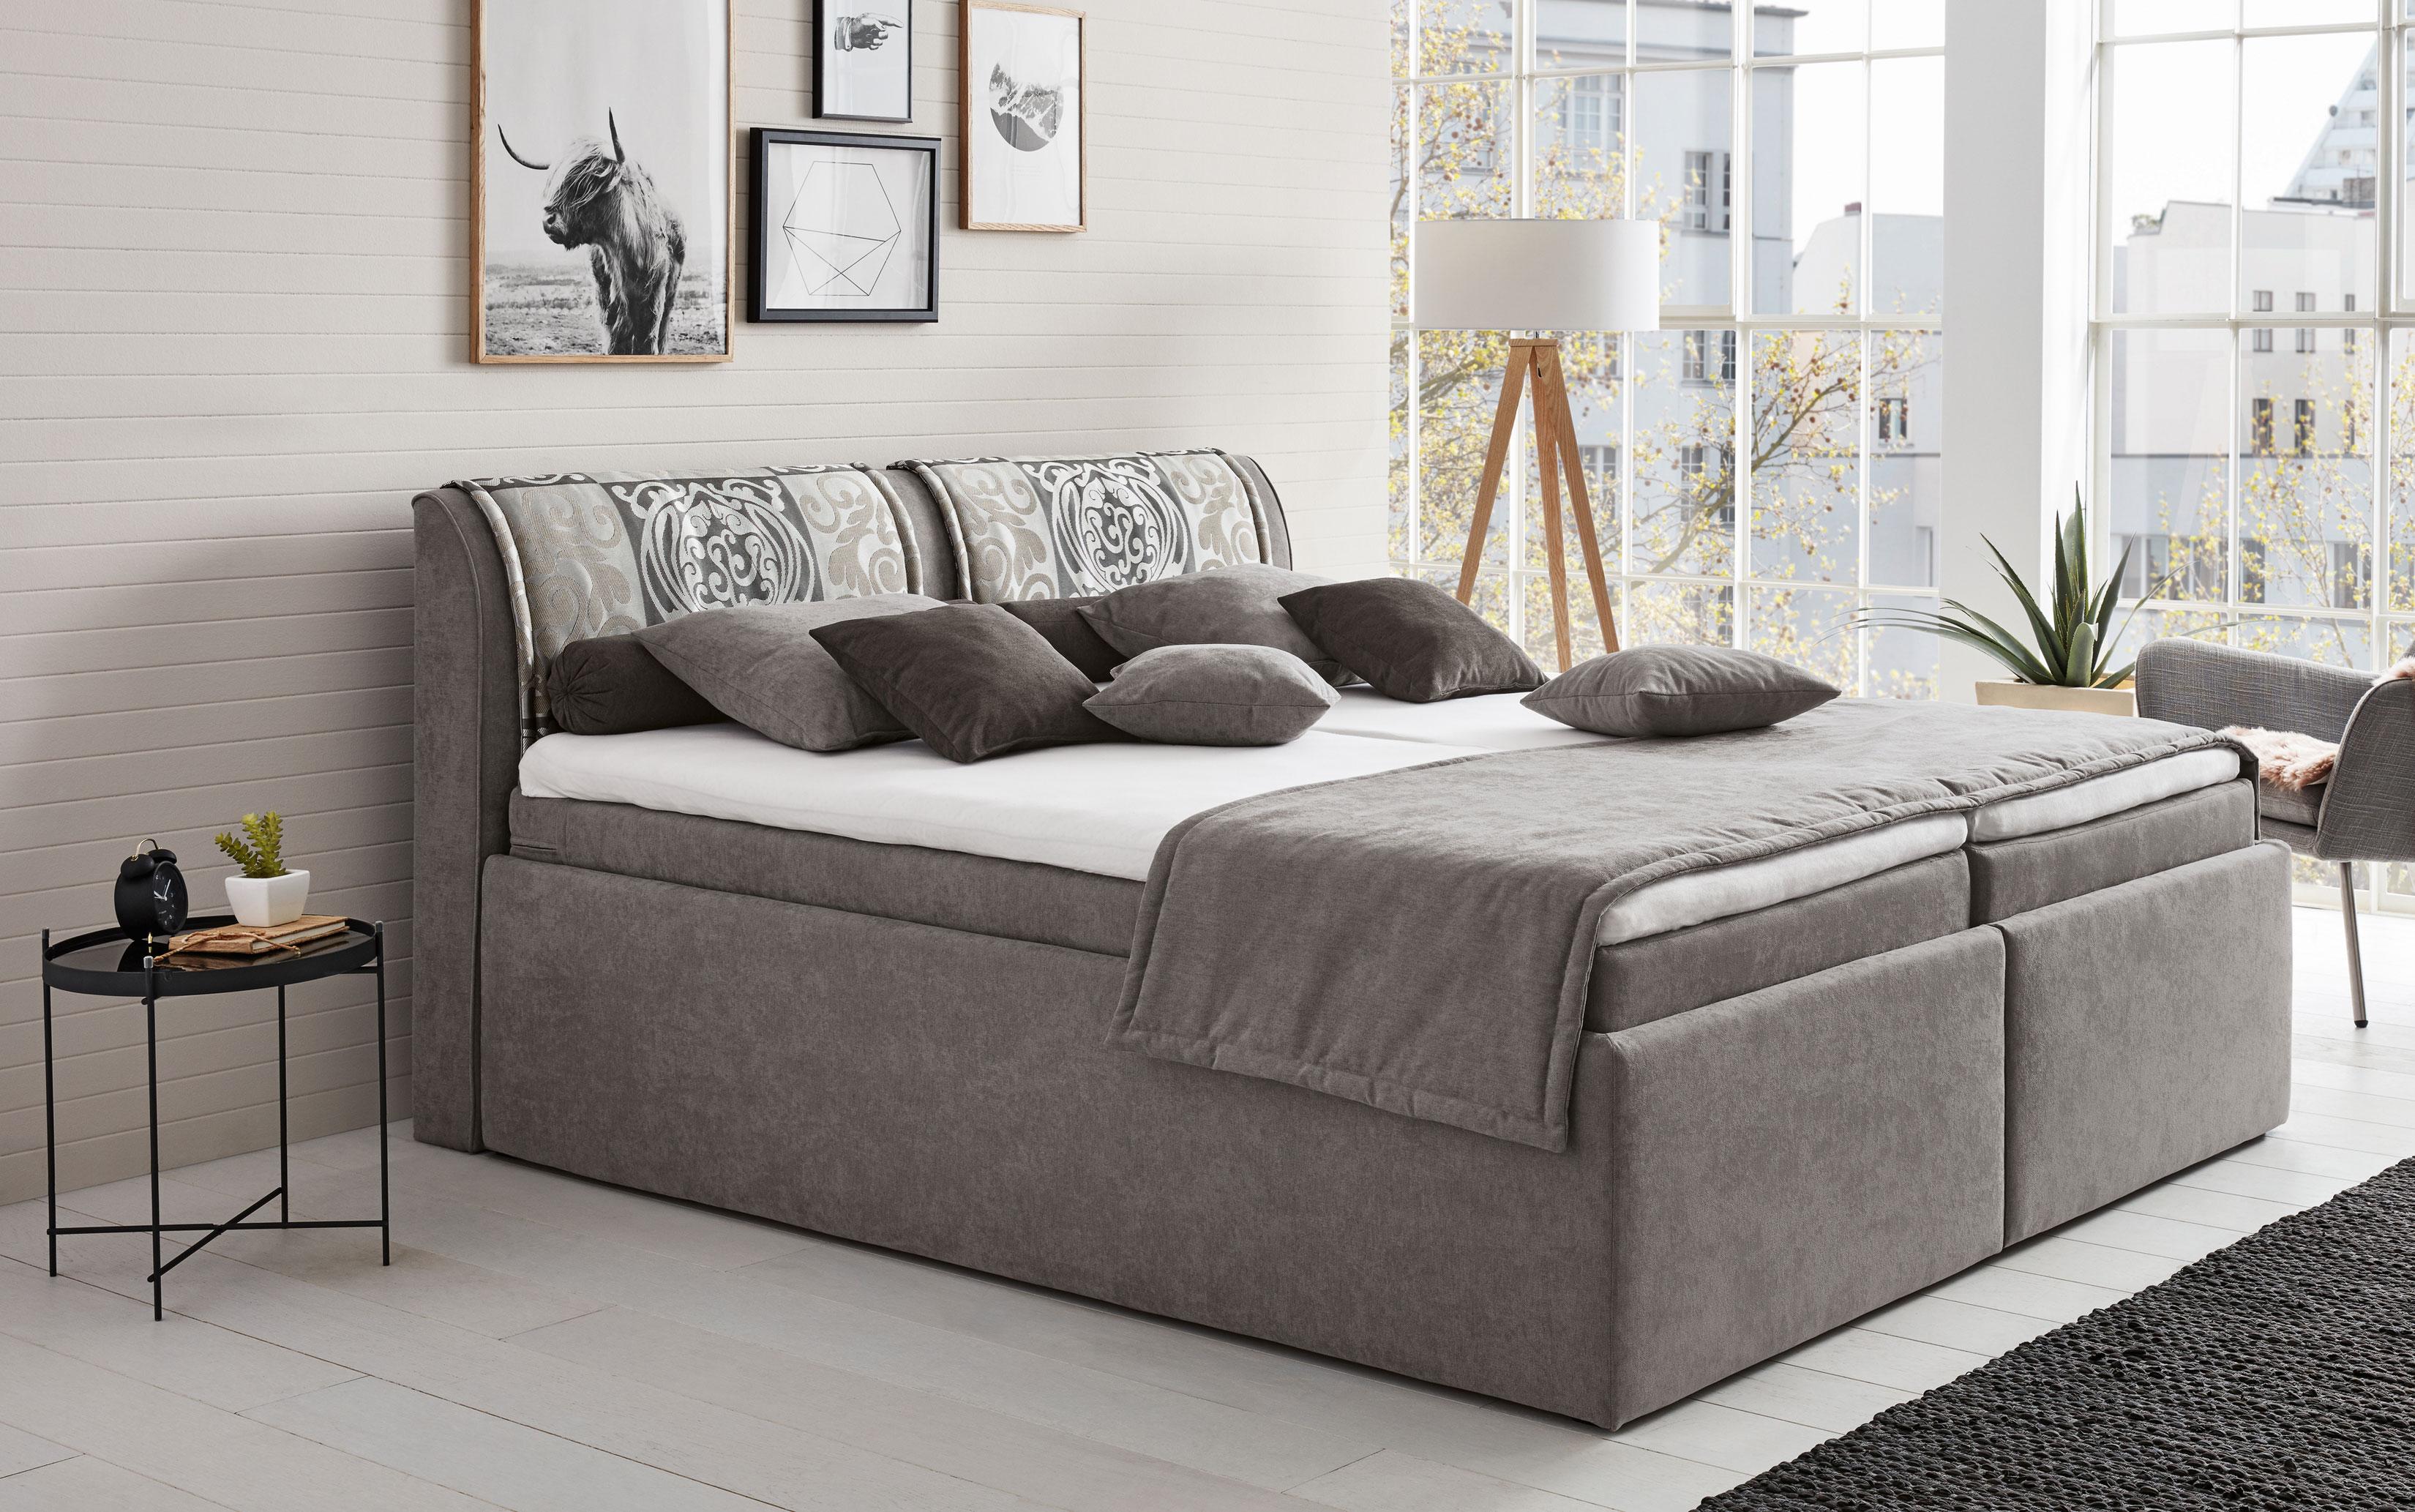 hapo leona polsterbett 180x200 cm mit bettkasten viele. Black Bedroom Furniture Sets. Home Design Ideas